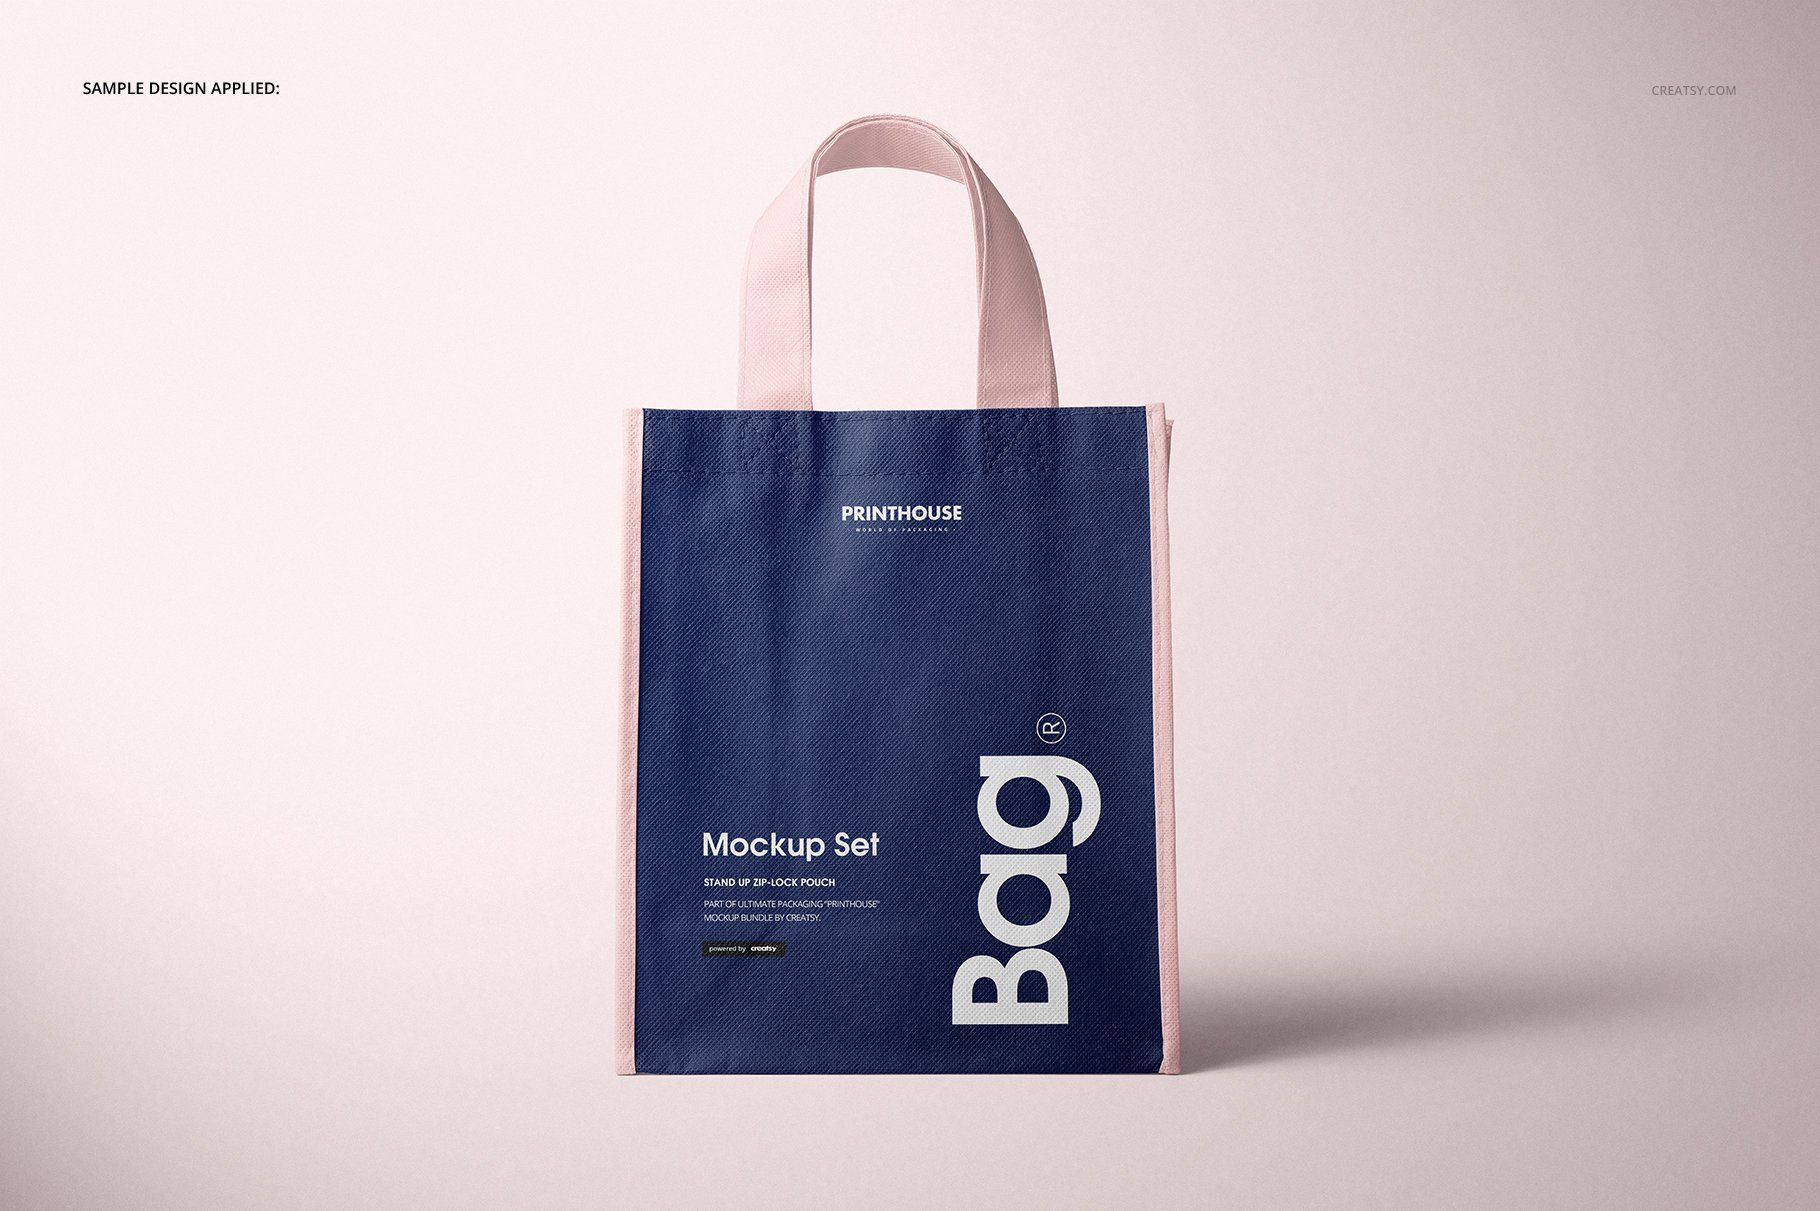 Download Non Woven Tote Bag Mockup Set Bag Mockup Woven Tote Bag Bags